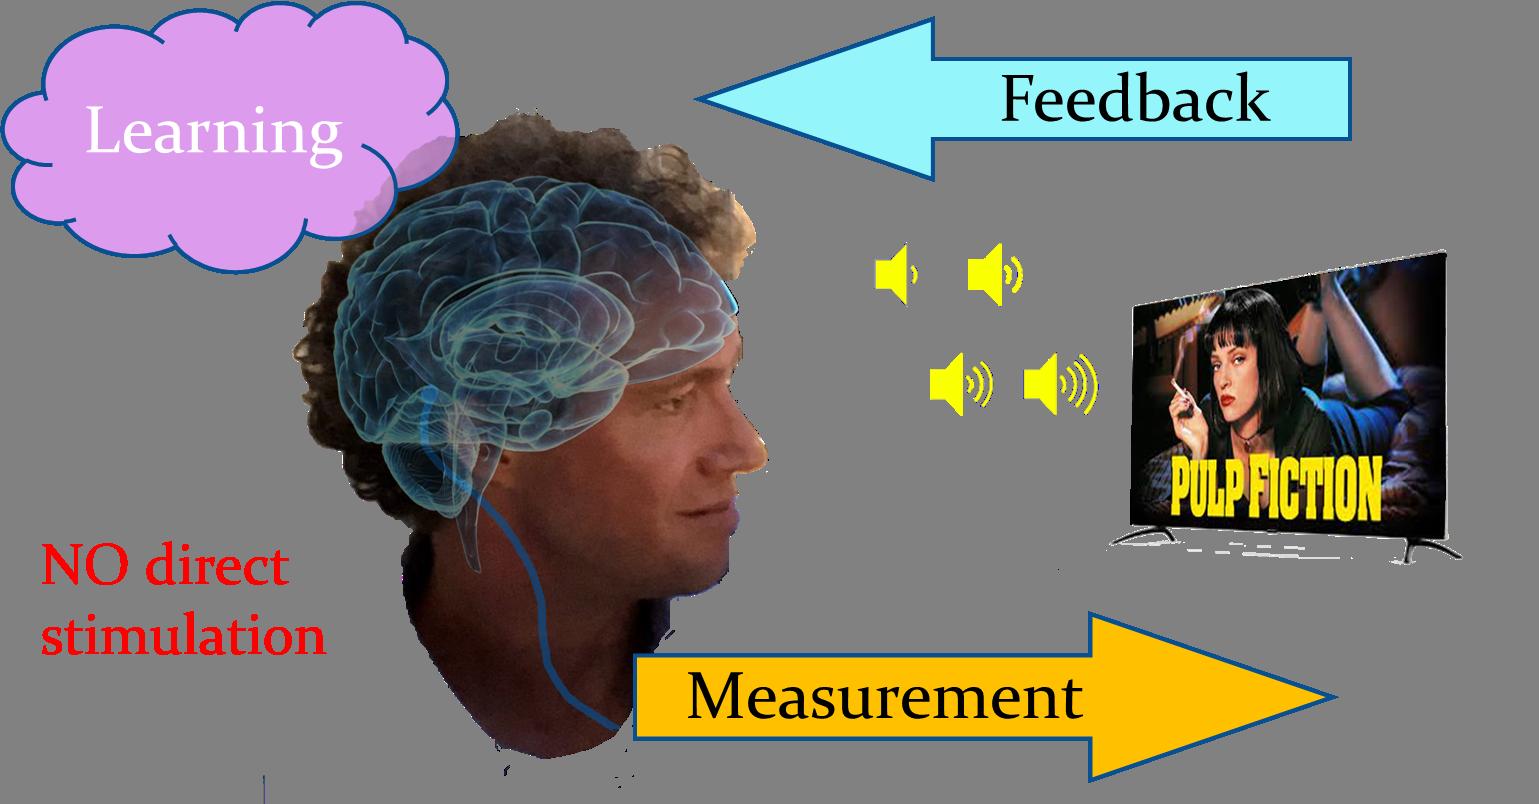 Neurofeedback training relies on real-time EEG measurement, analysis and translation into feedback